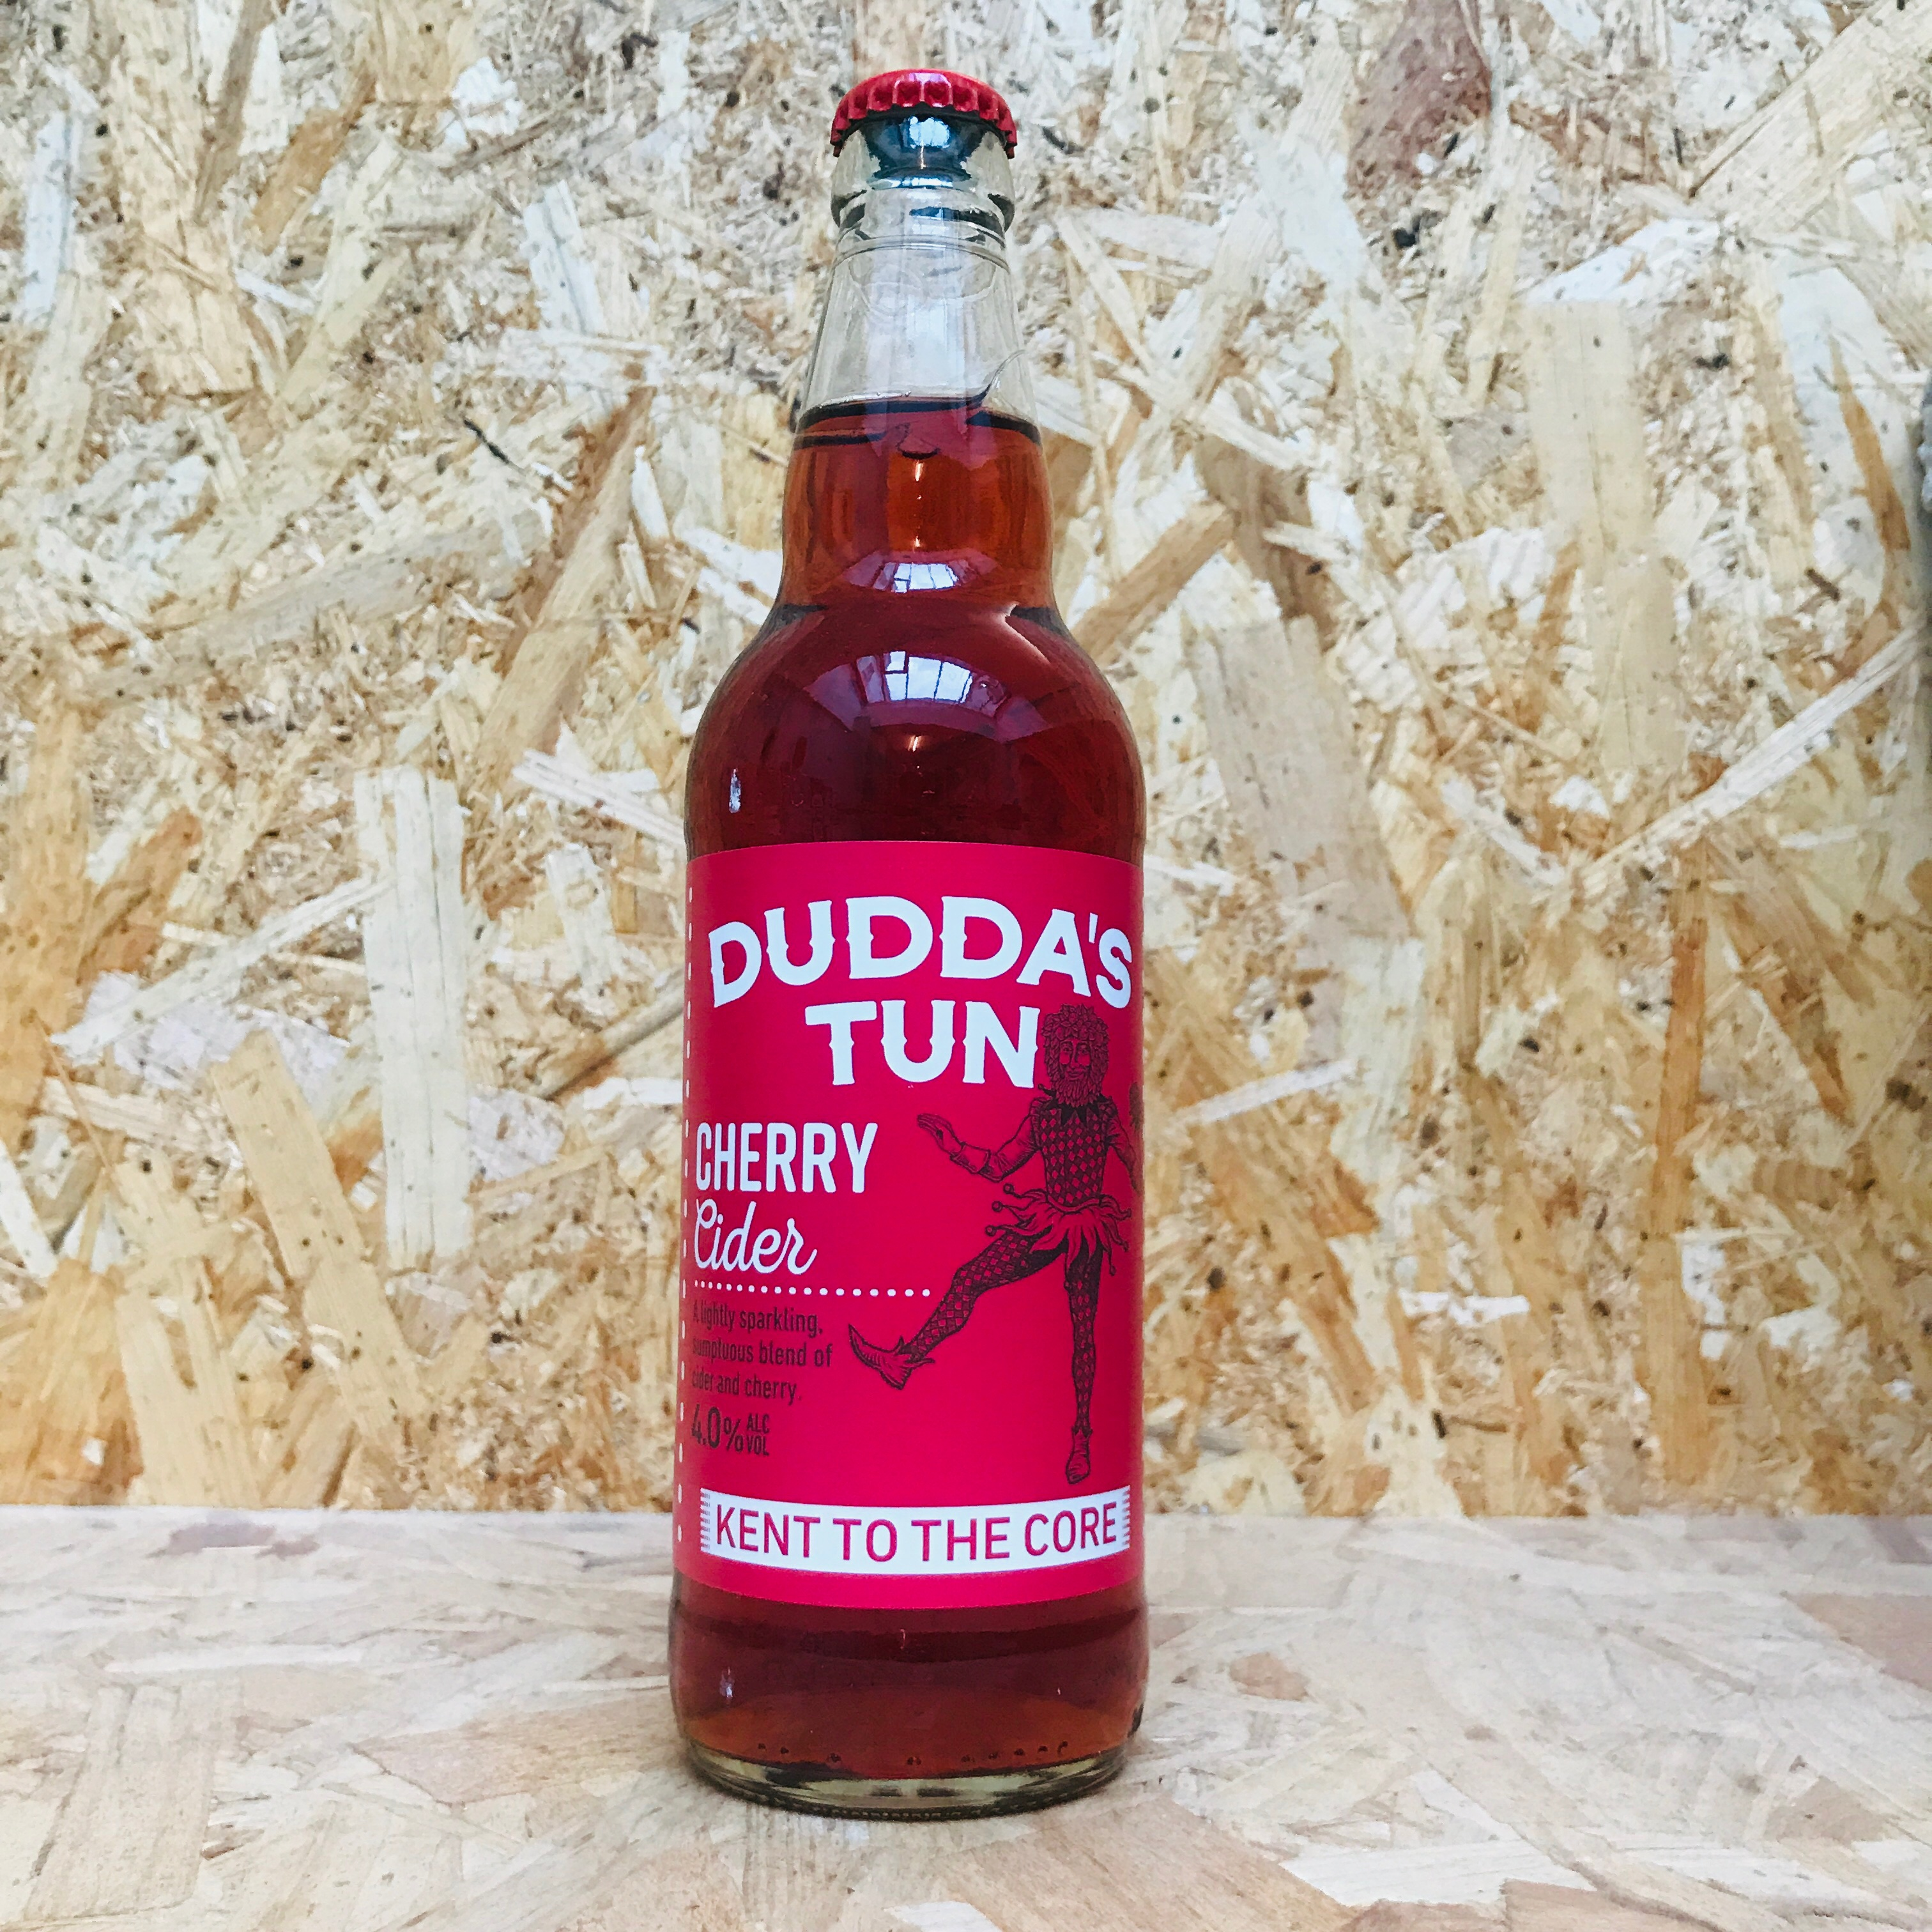 Dudda's Tun - Cherry